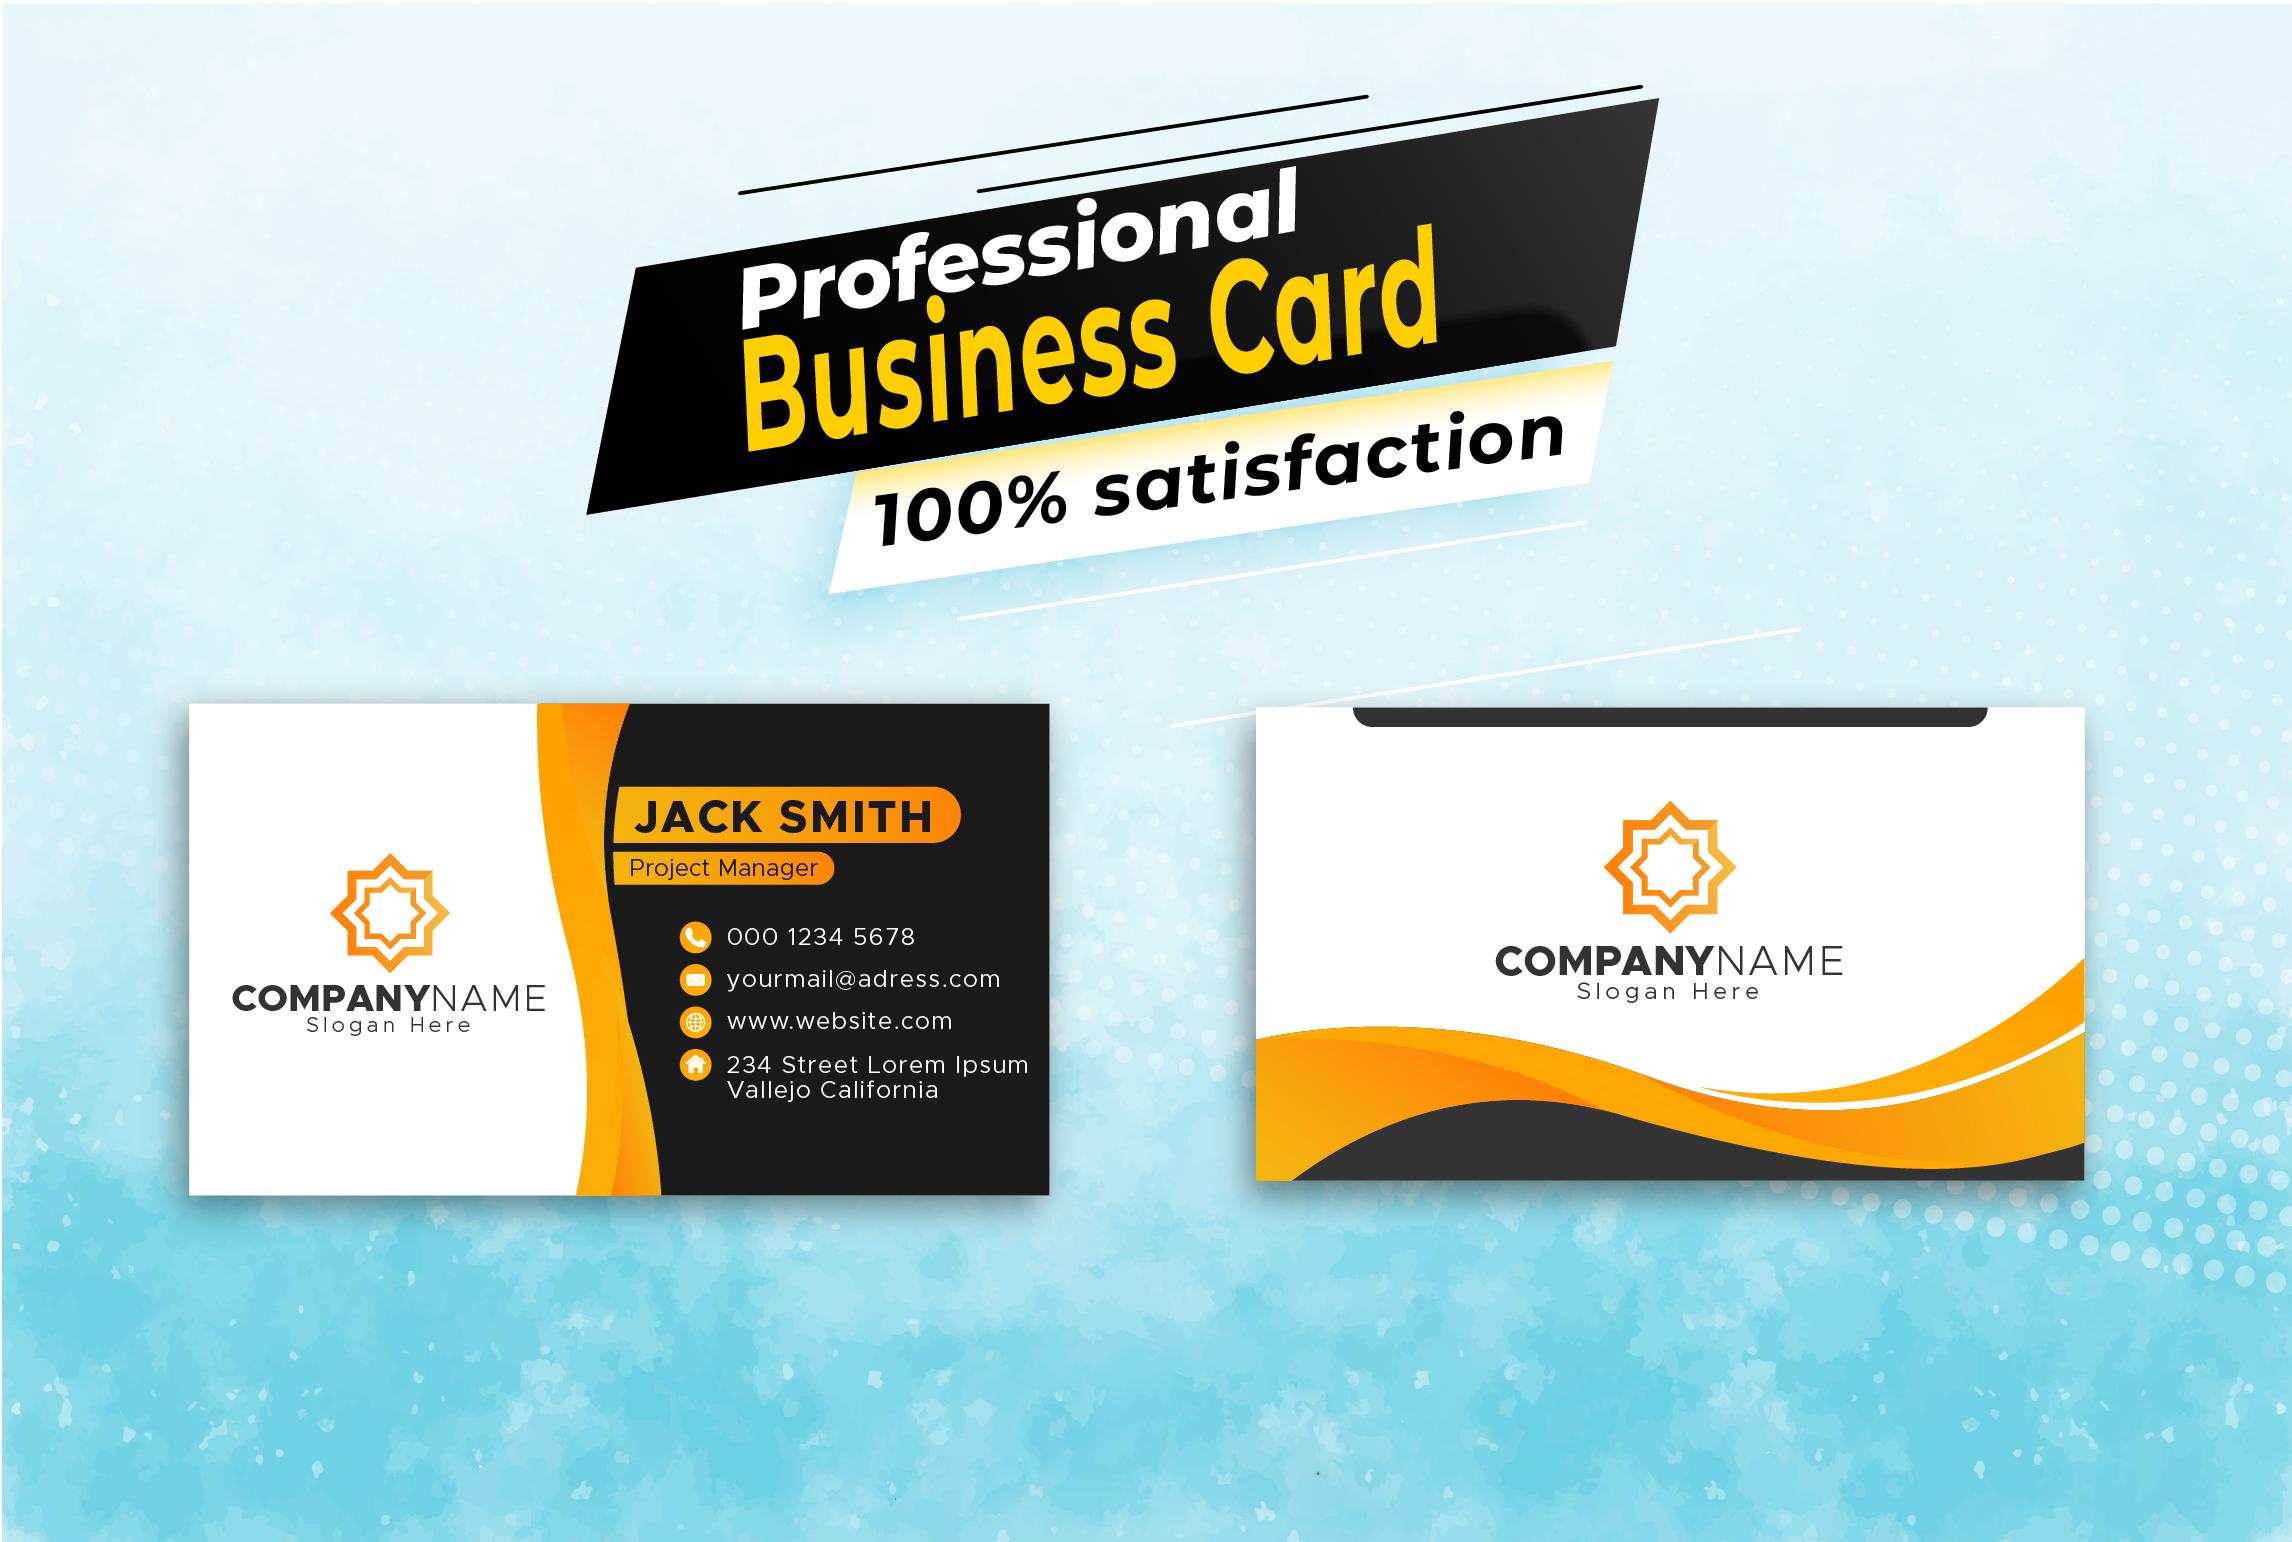 I will provide business card design service